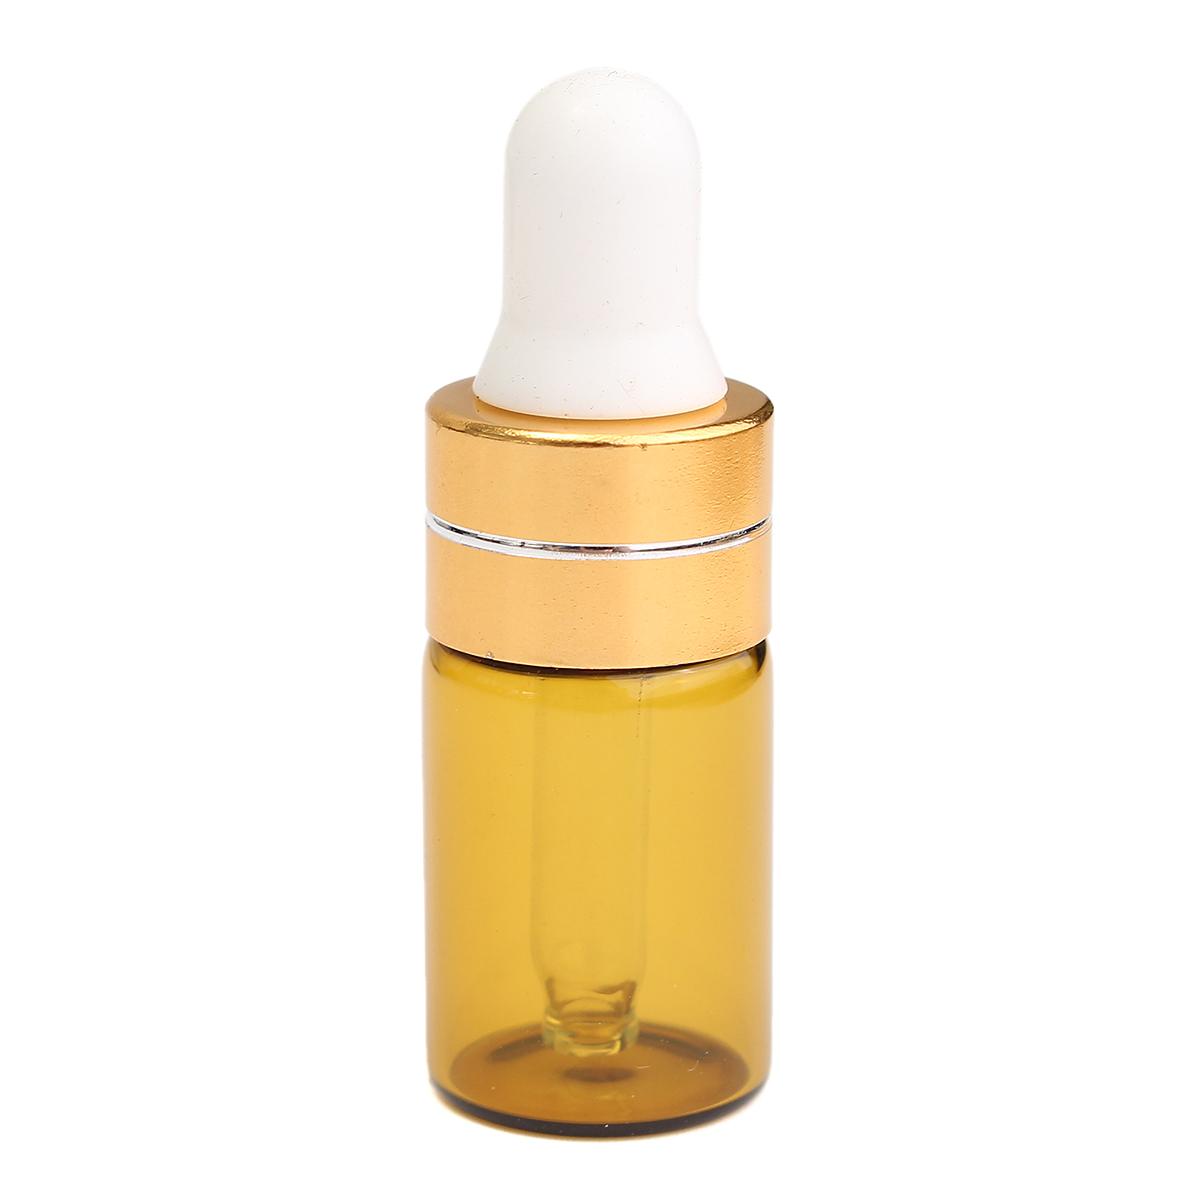 10pcs Empty Essential Oil Refillable Bottles 3ml Amber Glass Dropper Travel Vials Skin Care Tools